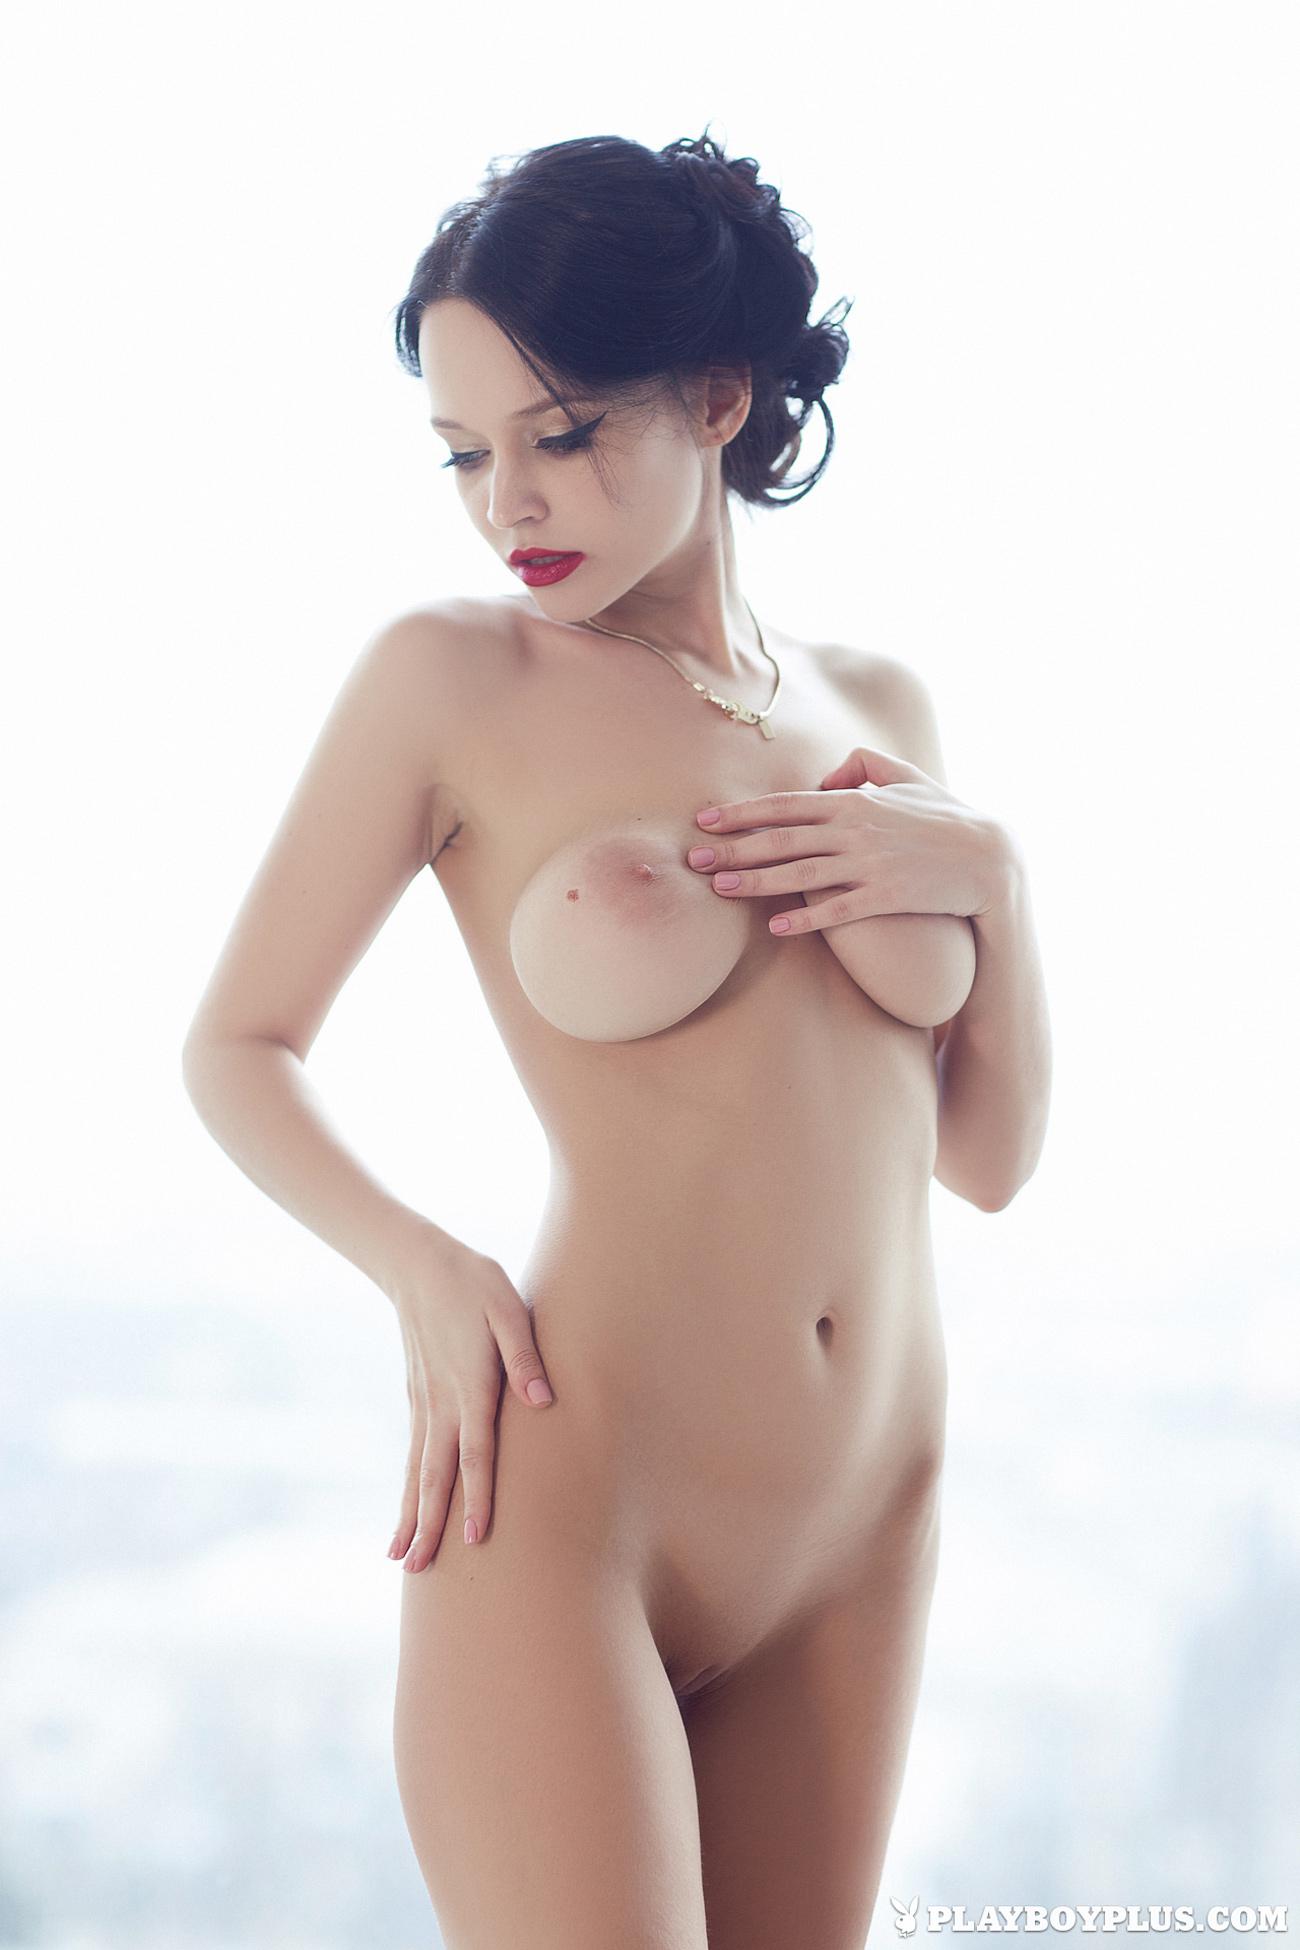 Angelina petrova porn